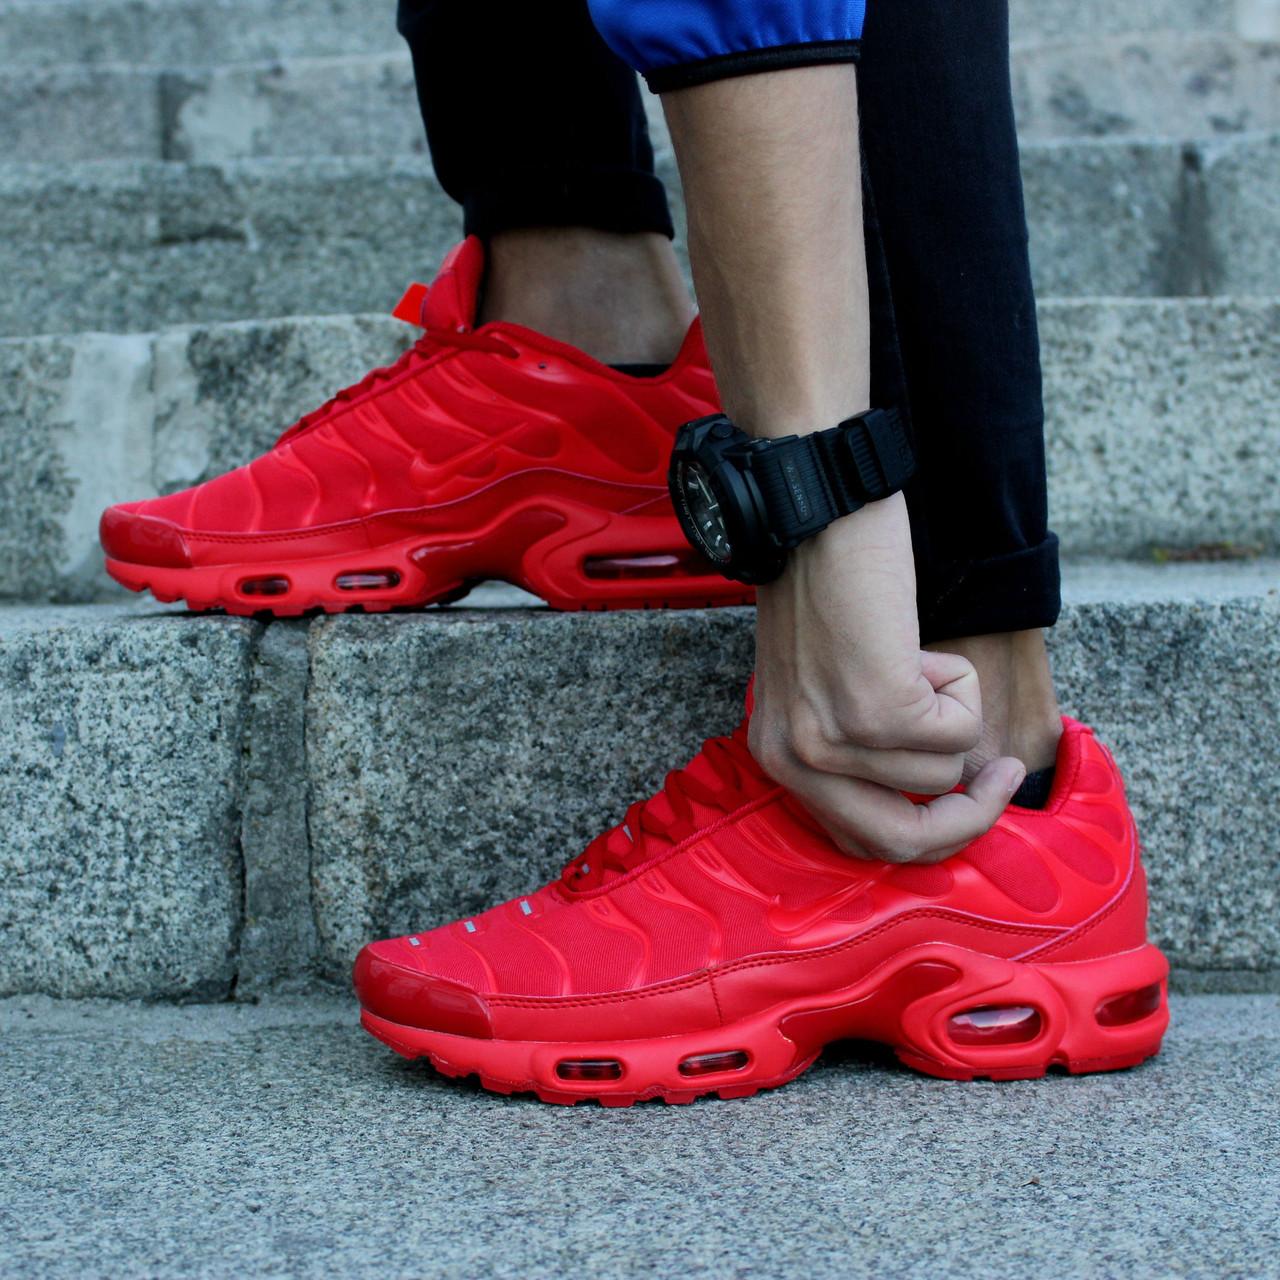 Nike Air Max TN Plus  Red (реплика)